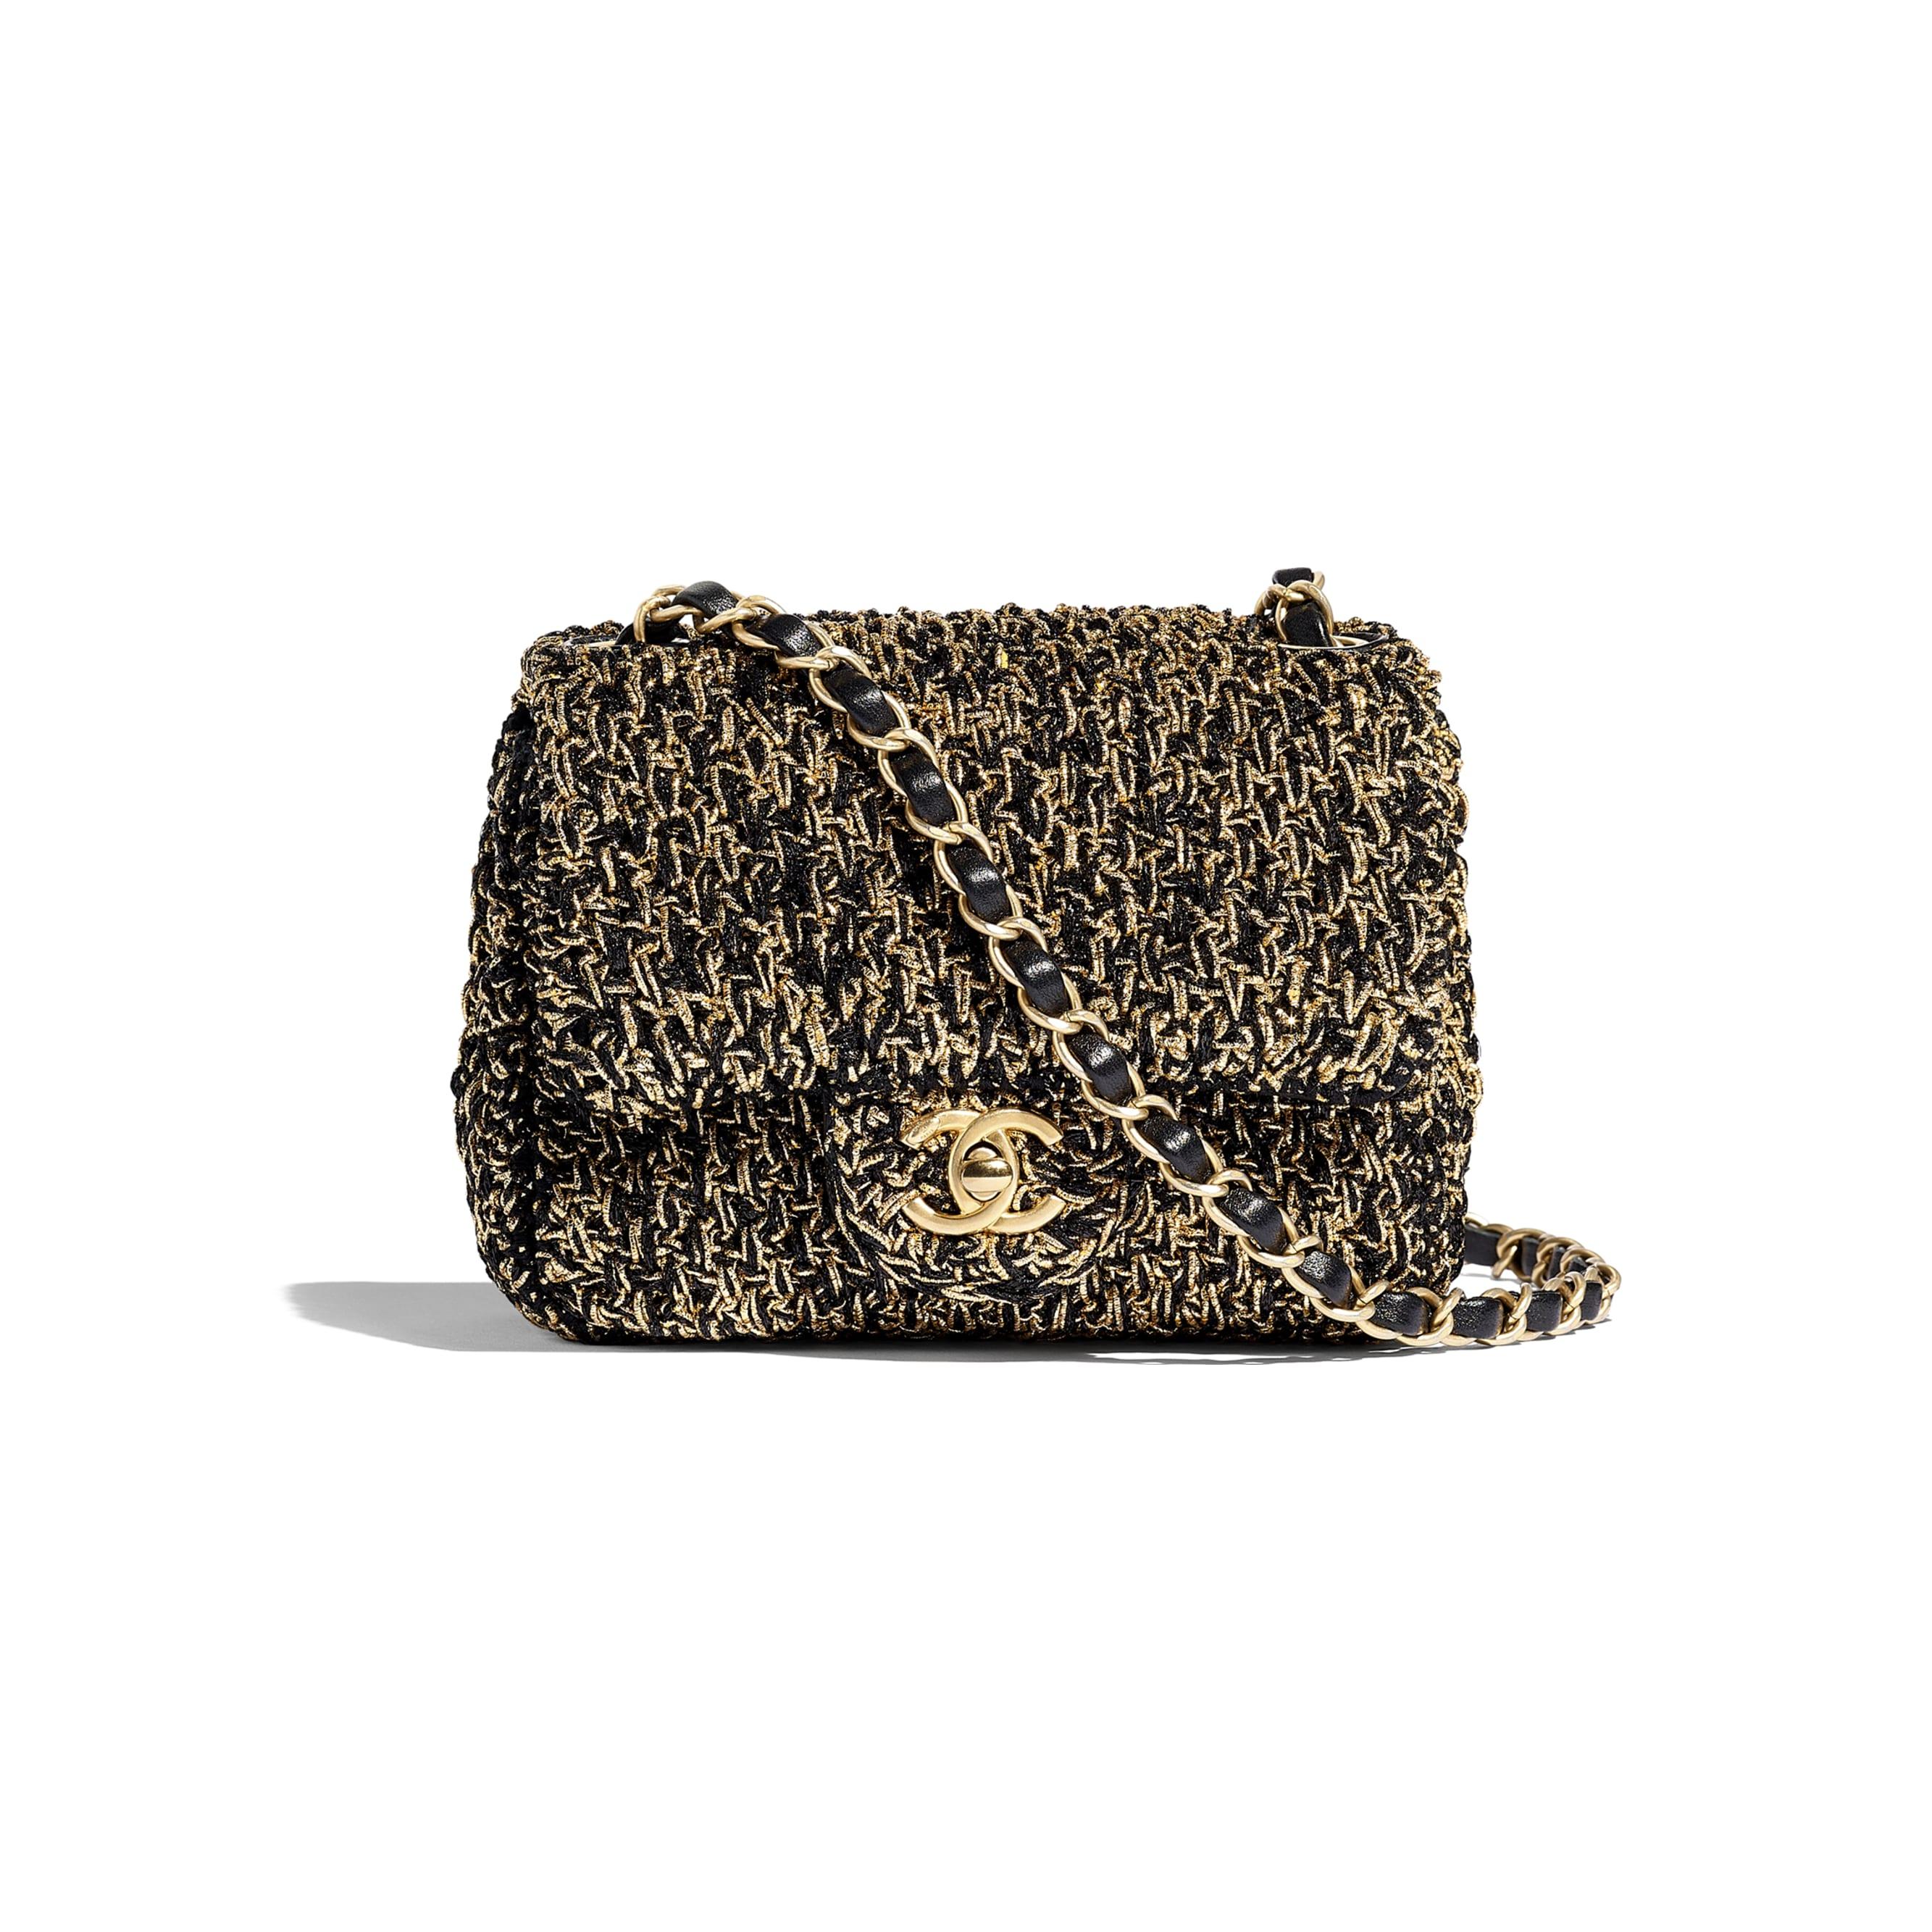 Mini Flap Bag - Black & Gold - Cotton, Mixed Fibers & Gold-Tone Metal - Default view - see standard sized version